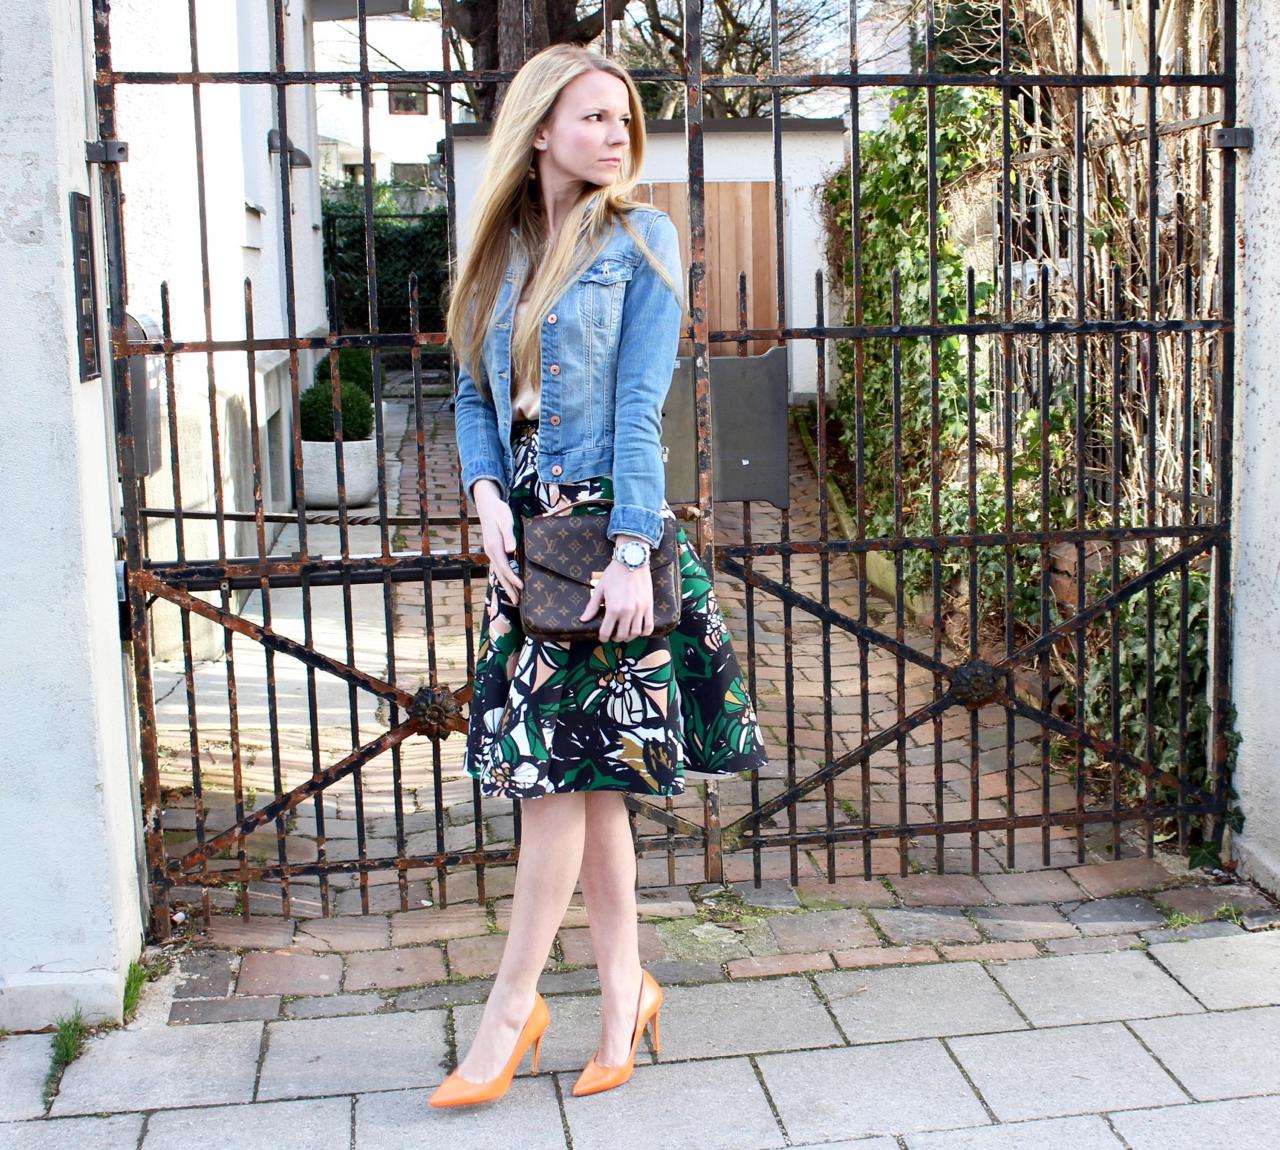 Midirock und Jeansjacke Jennifer Outfit Fashion April Jeans Denim Gucci Zara HundM H&M Hallhuber Rock Mode Lifestyle LouisVuitton LV Vuitton PepperAndGold Pochette Métis Jenni